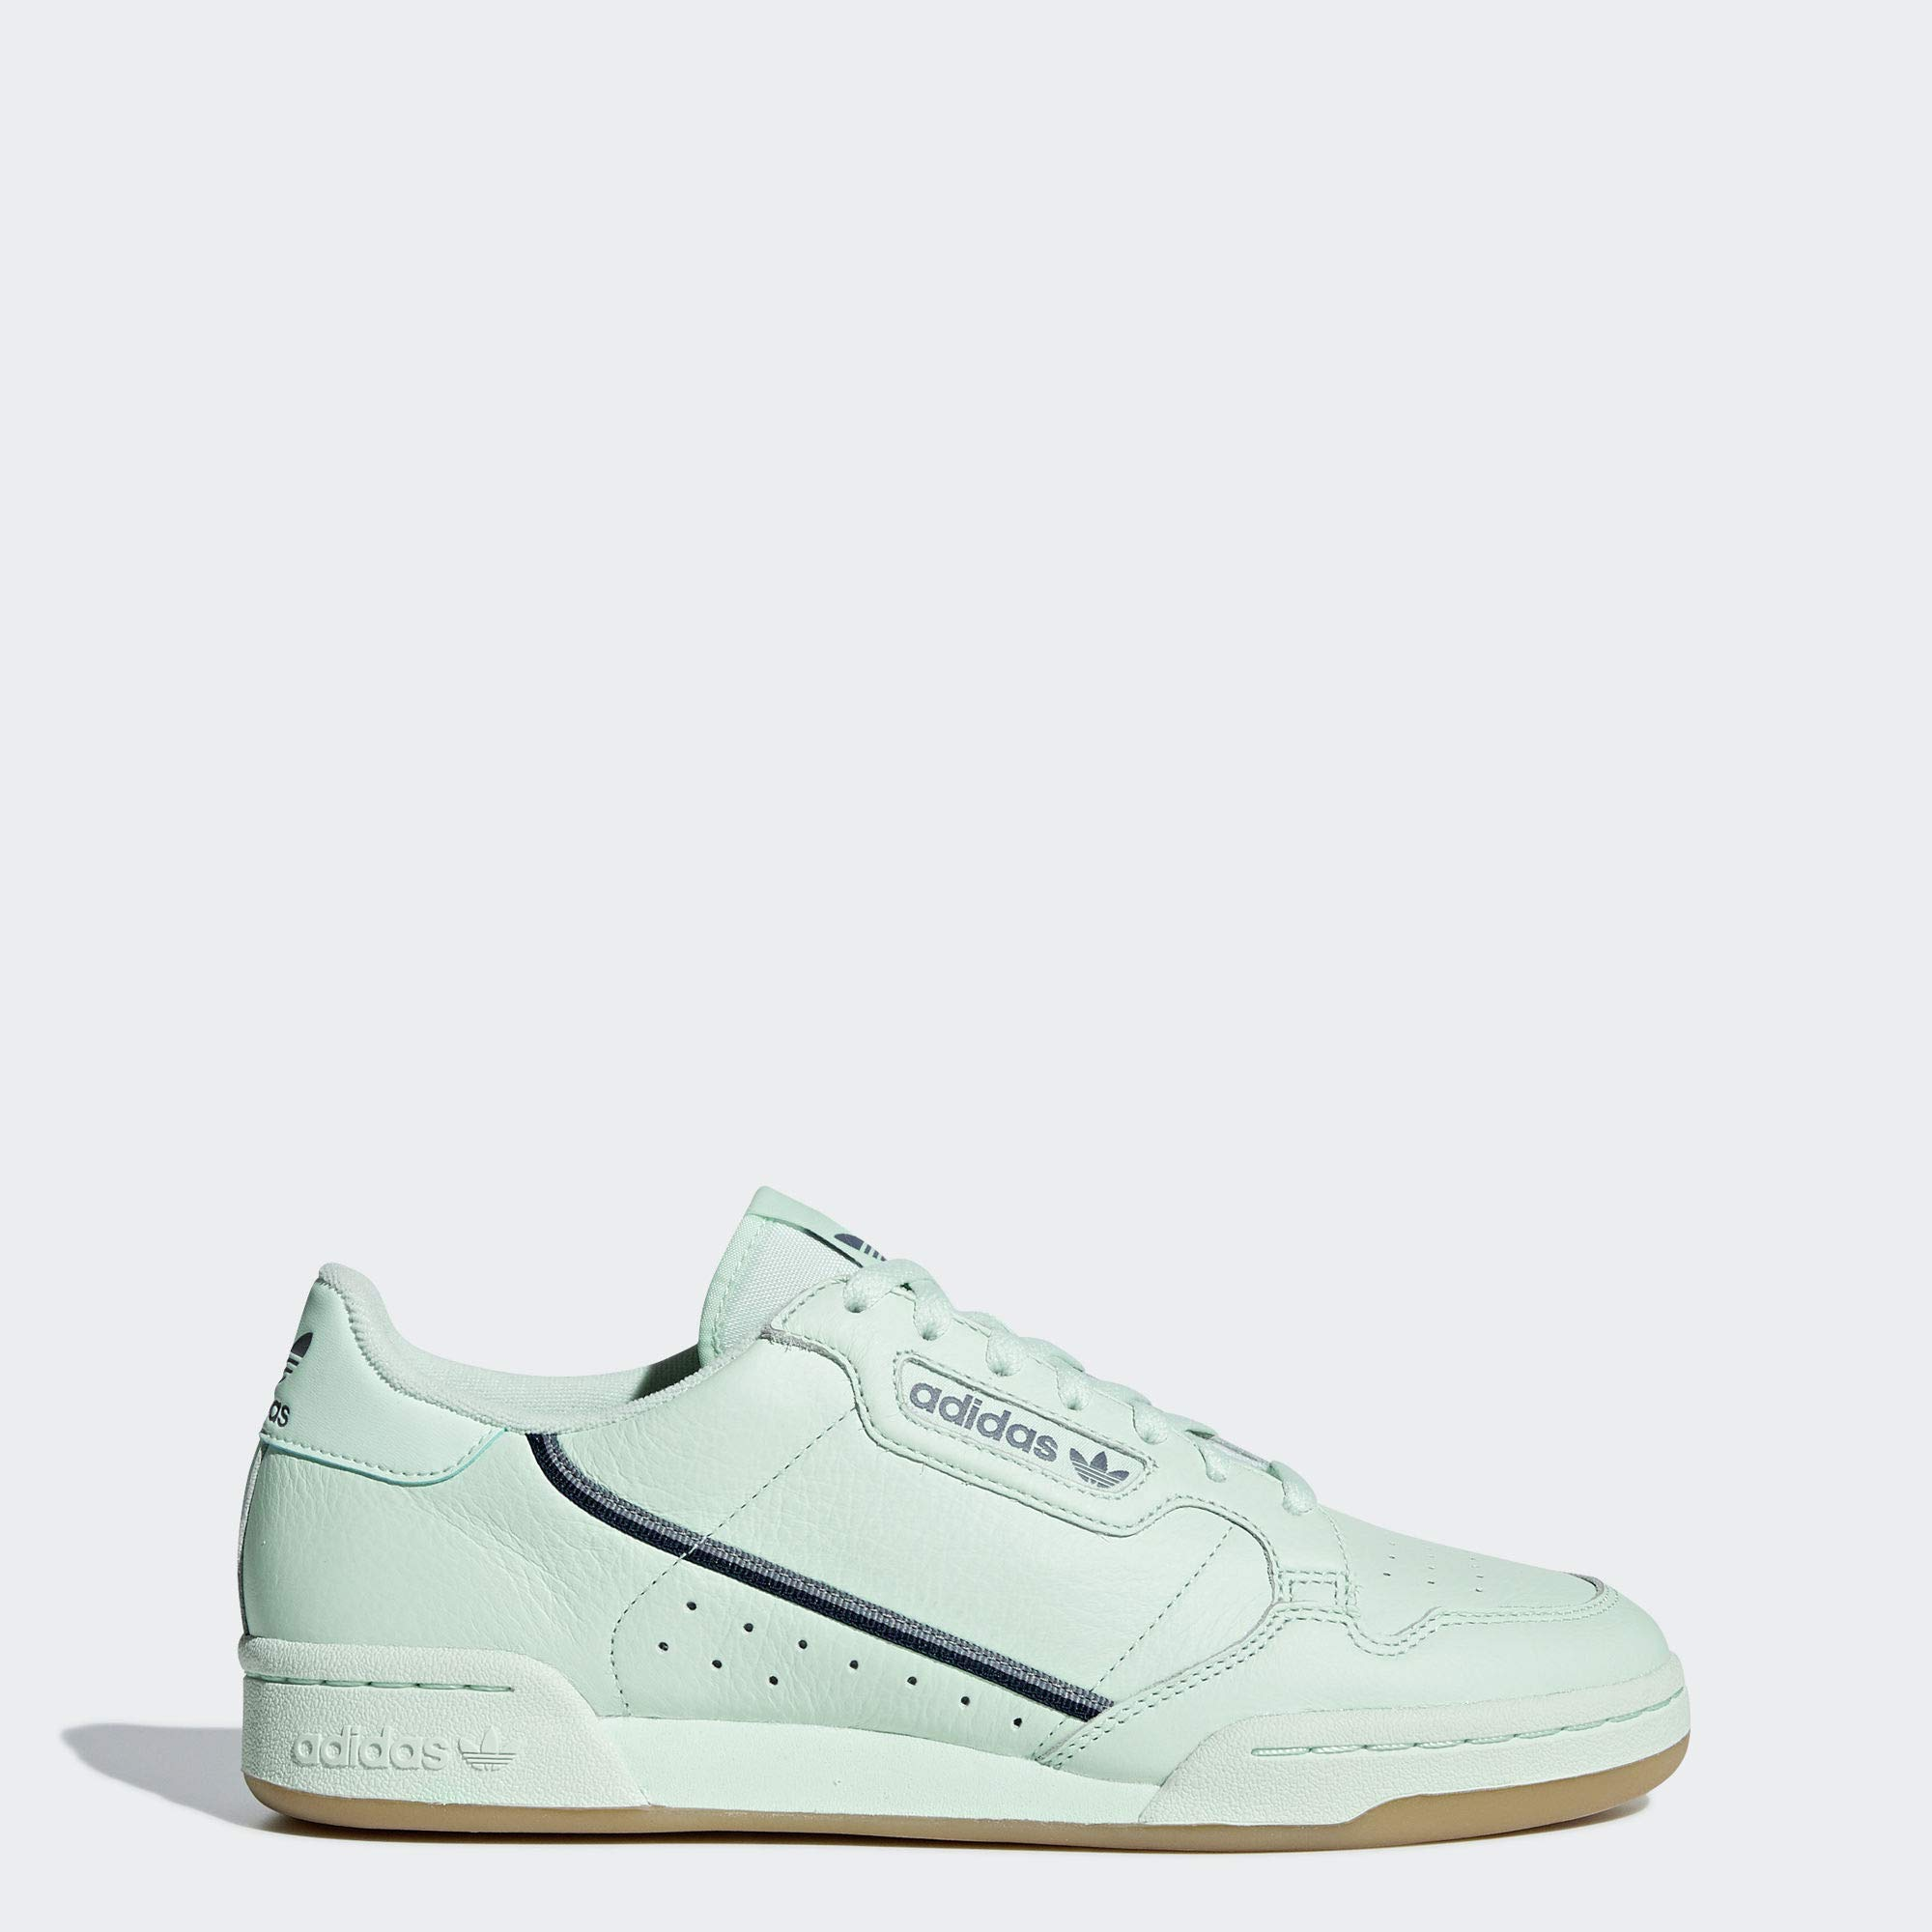 adidas Originals Men's Continental 80 Sneaker Ice mint/collegiate Navy/Grey 10 Medium US by adidas Originals